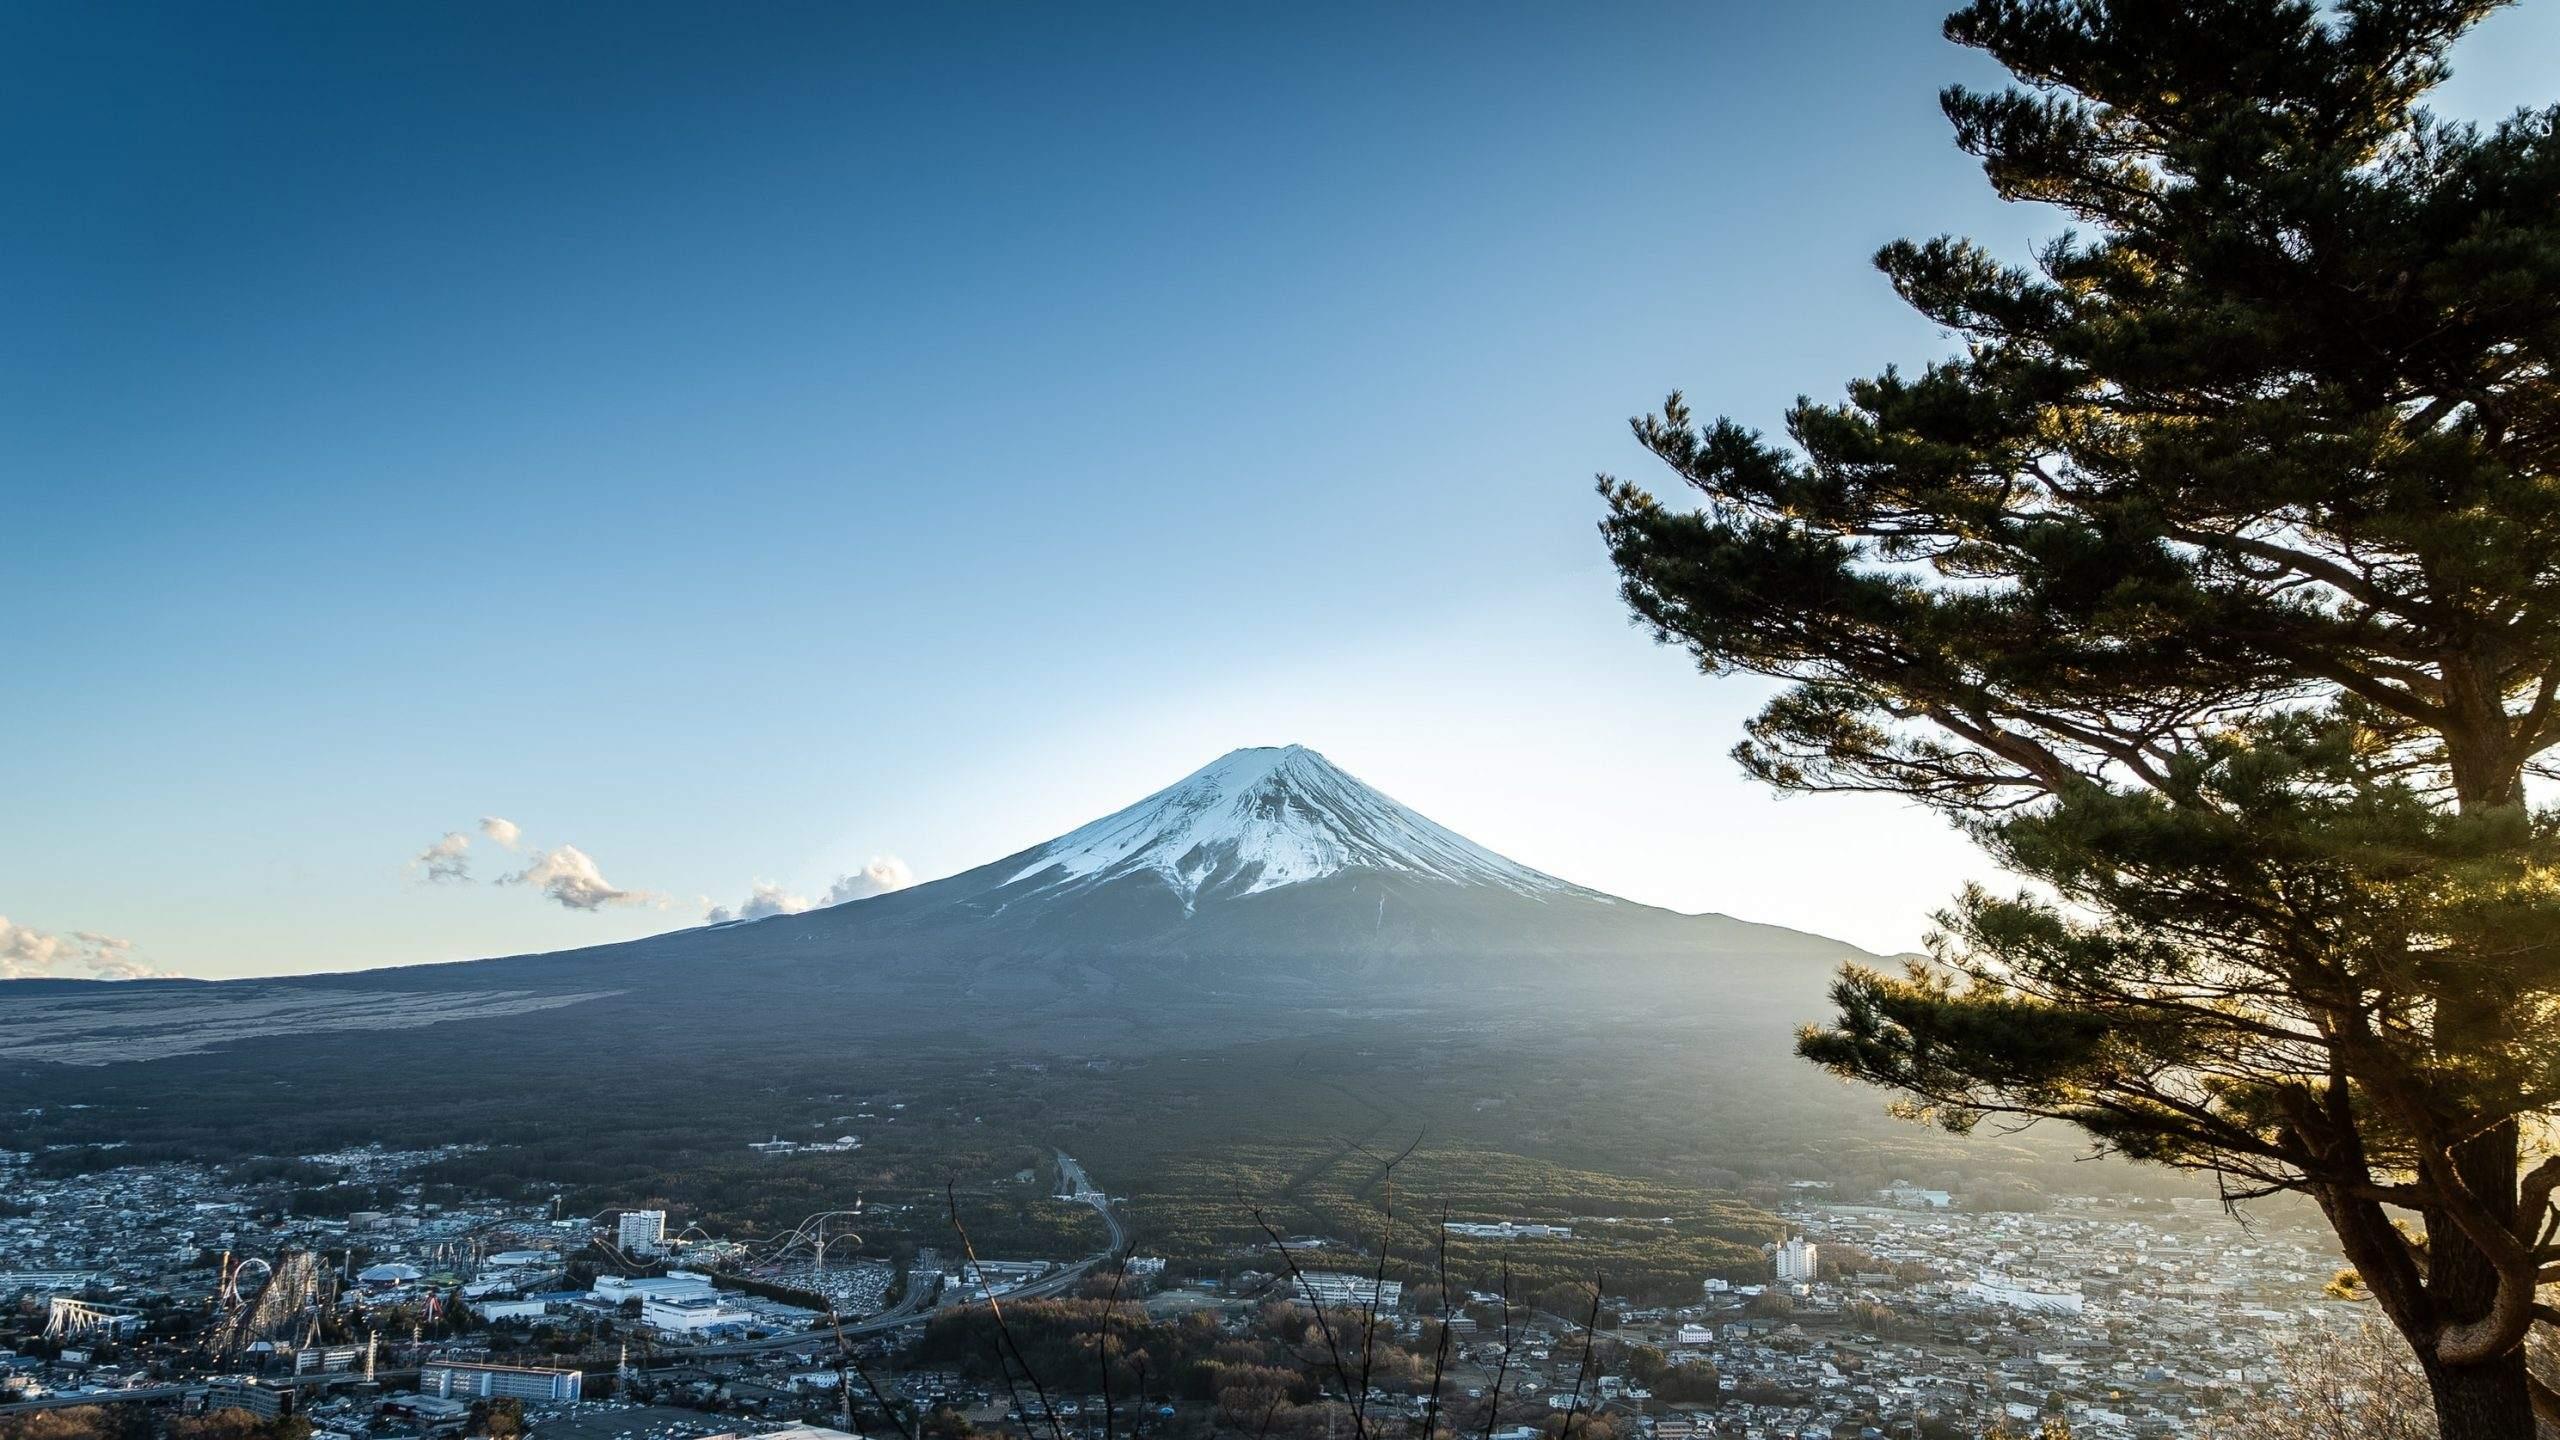 Der Fuji in Japan - neuer Mega-Stimulus